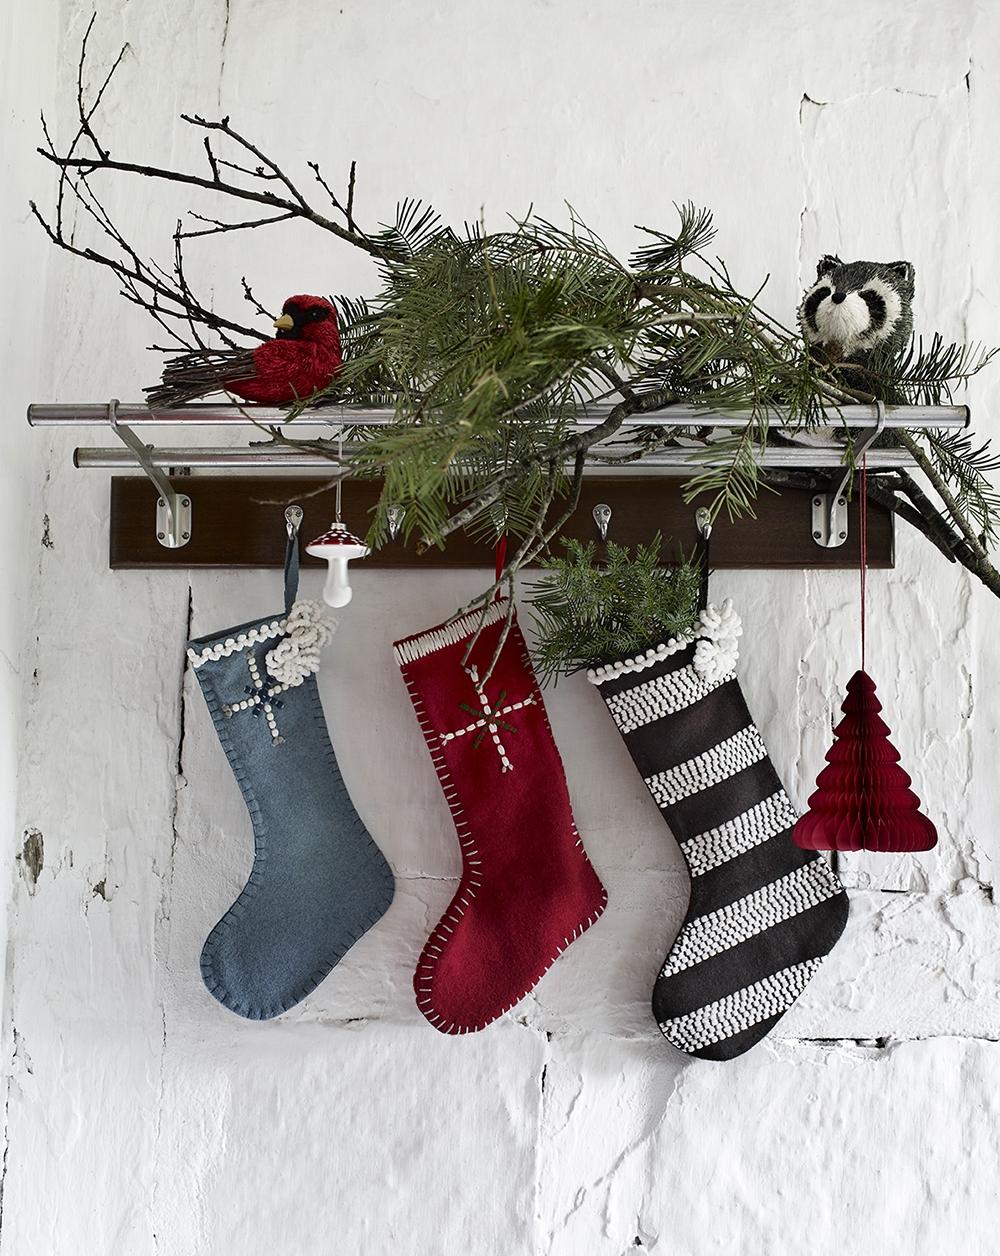 Christmas_2014_2_X.jpg